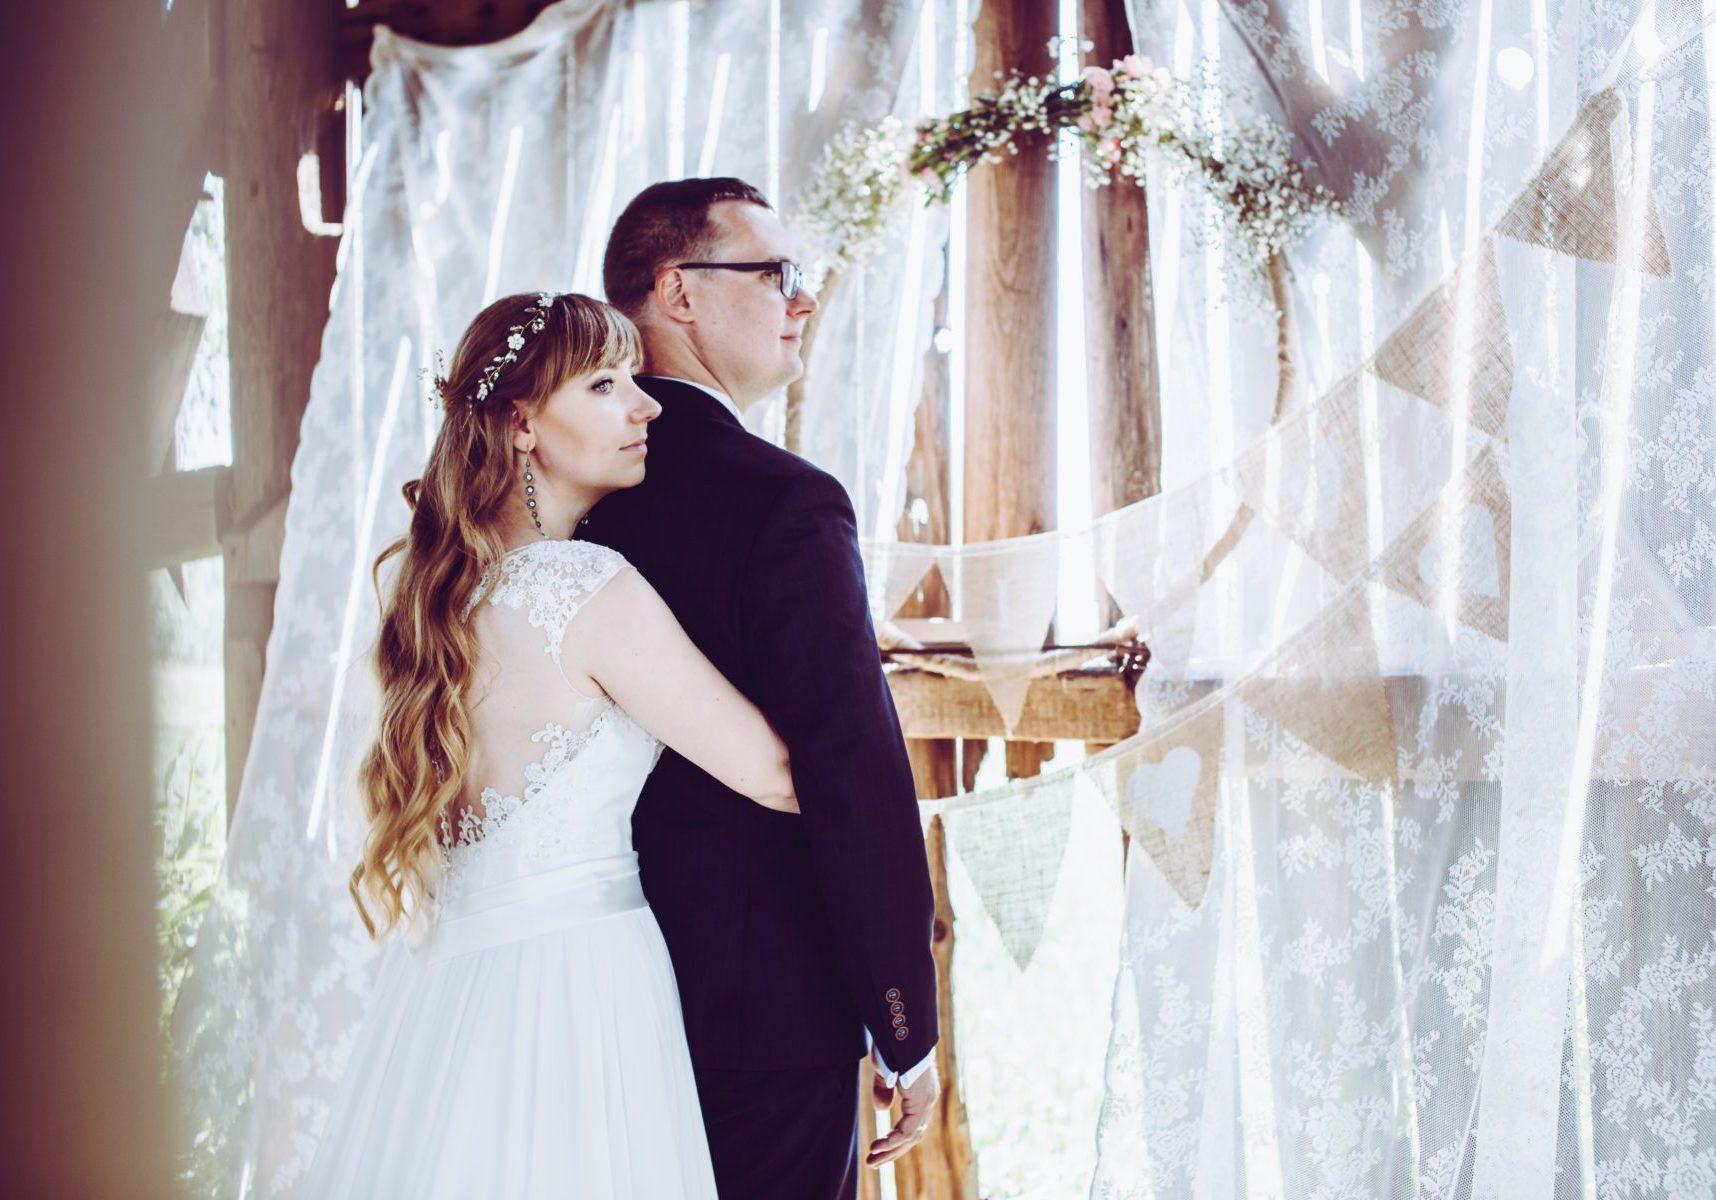 Sesja fotograficzna Weroniki i Macieja